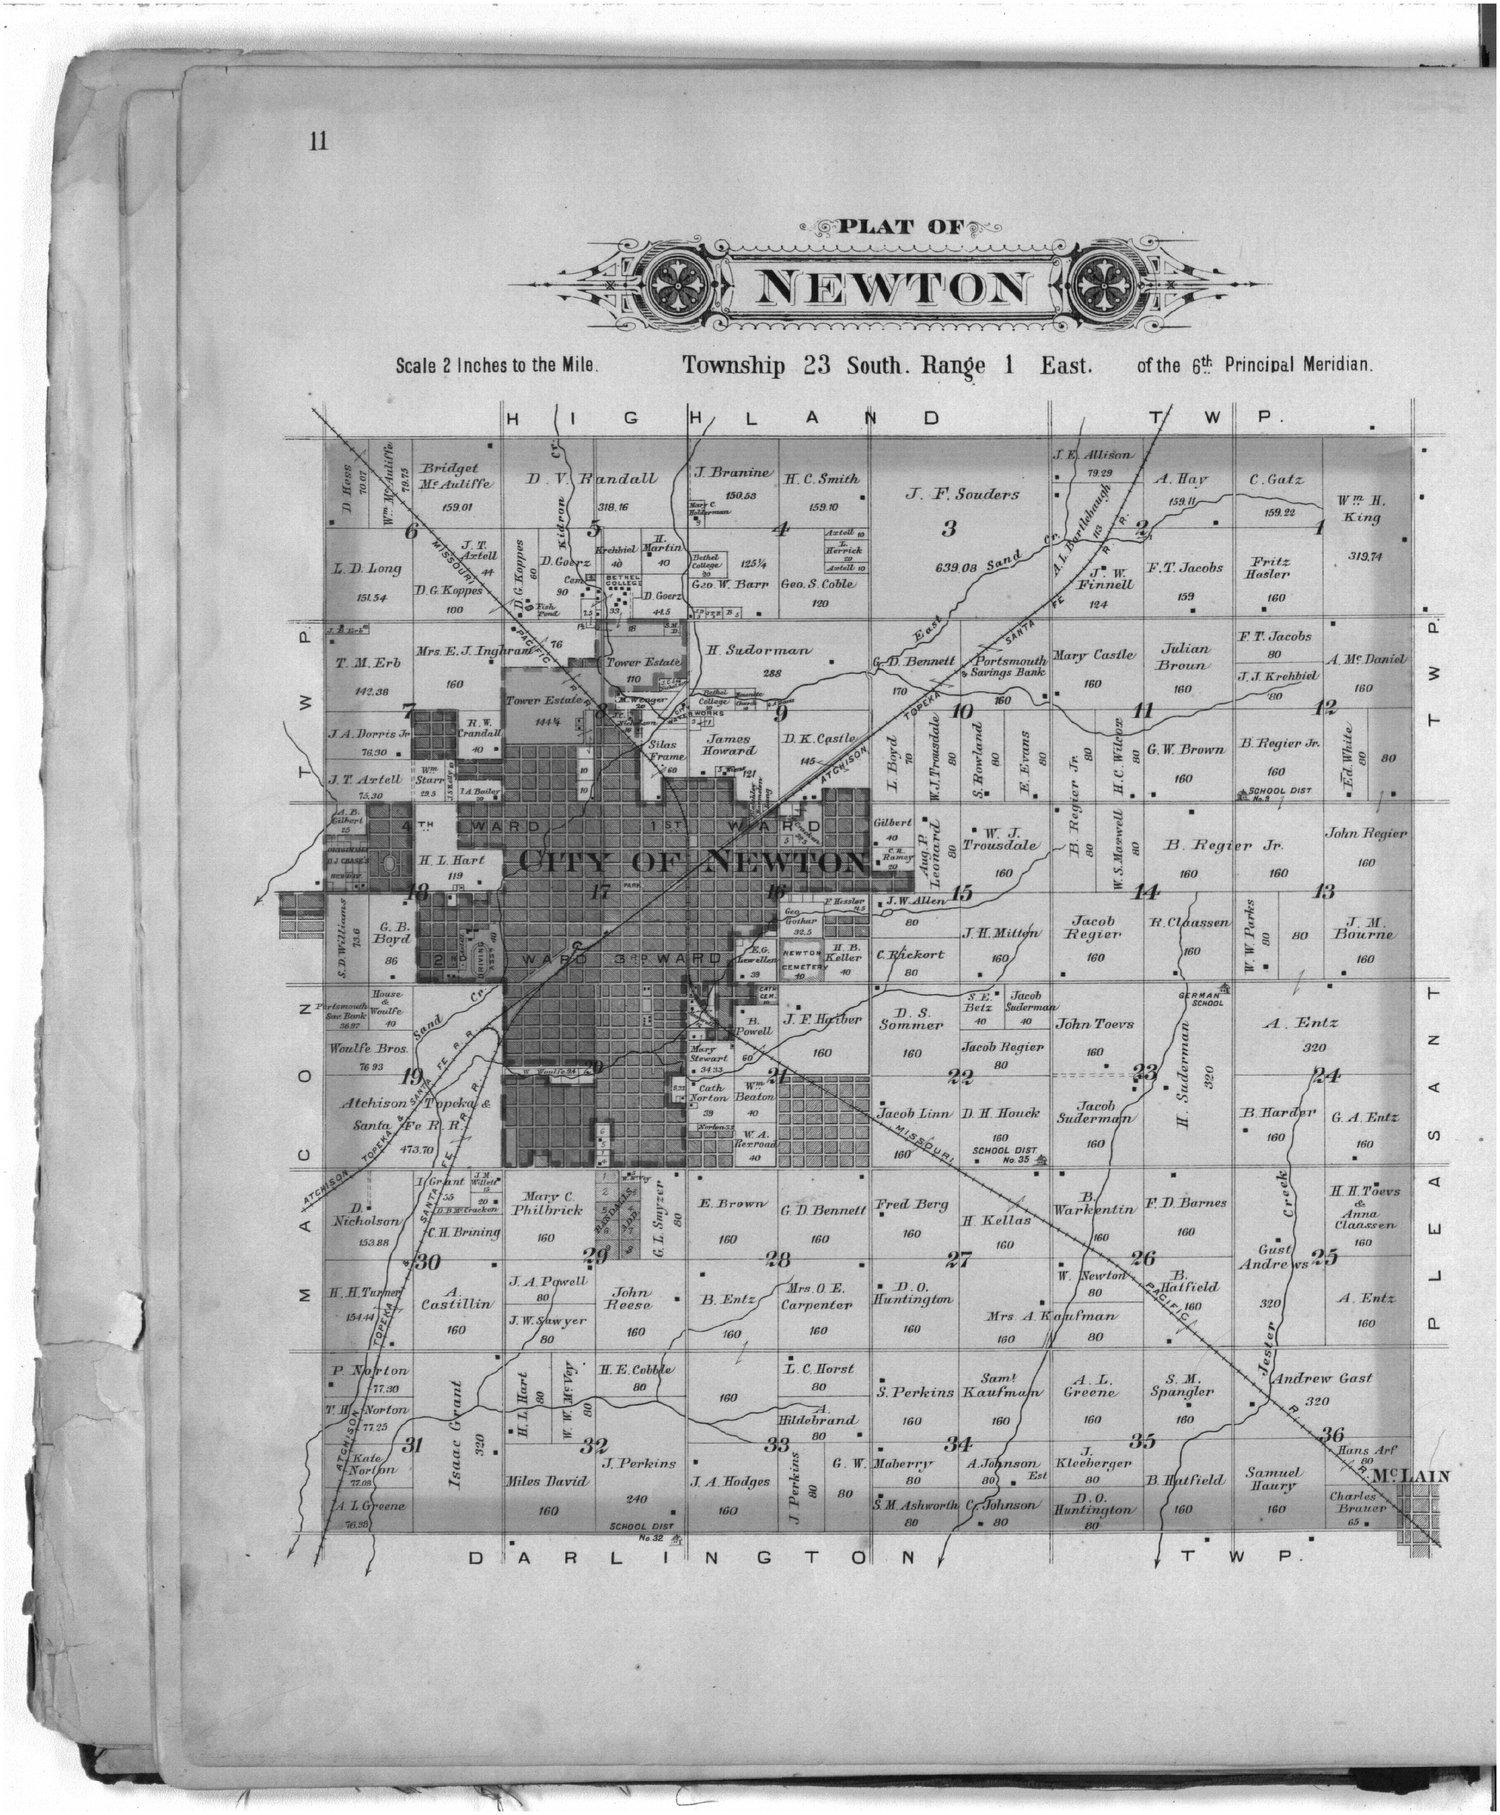 Plat book of Harvey County, Kansas - 11